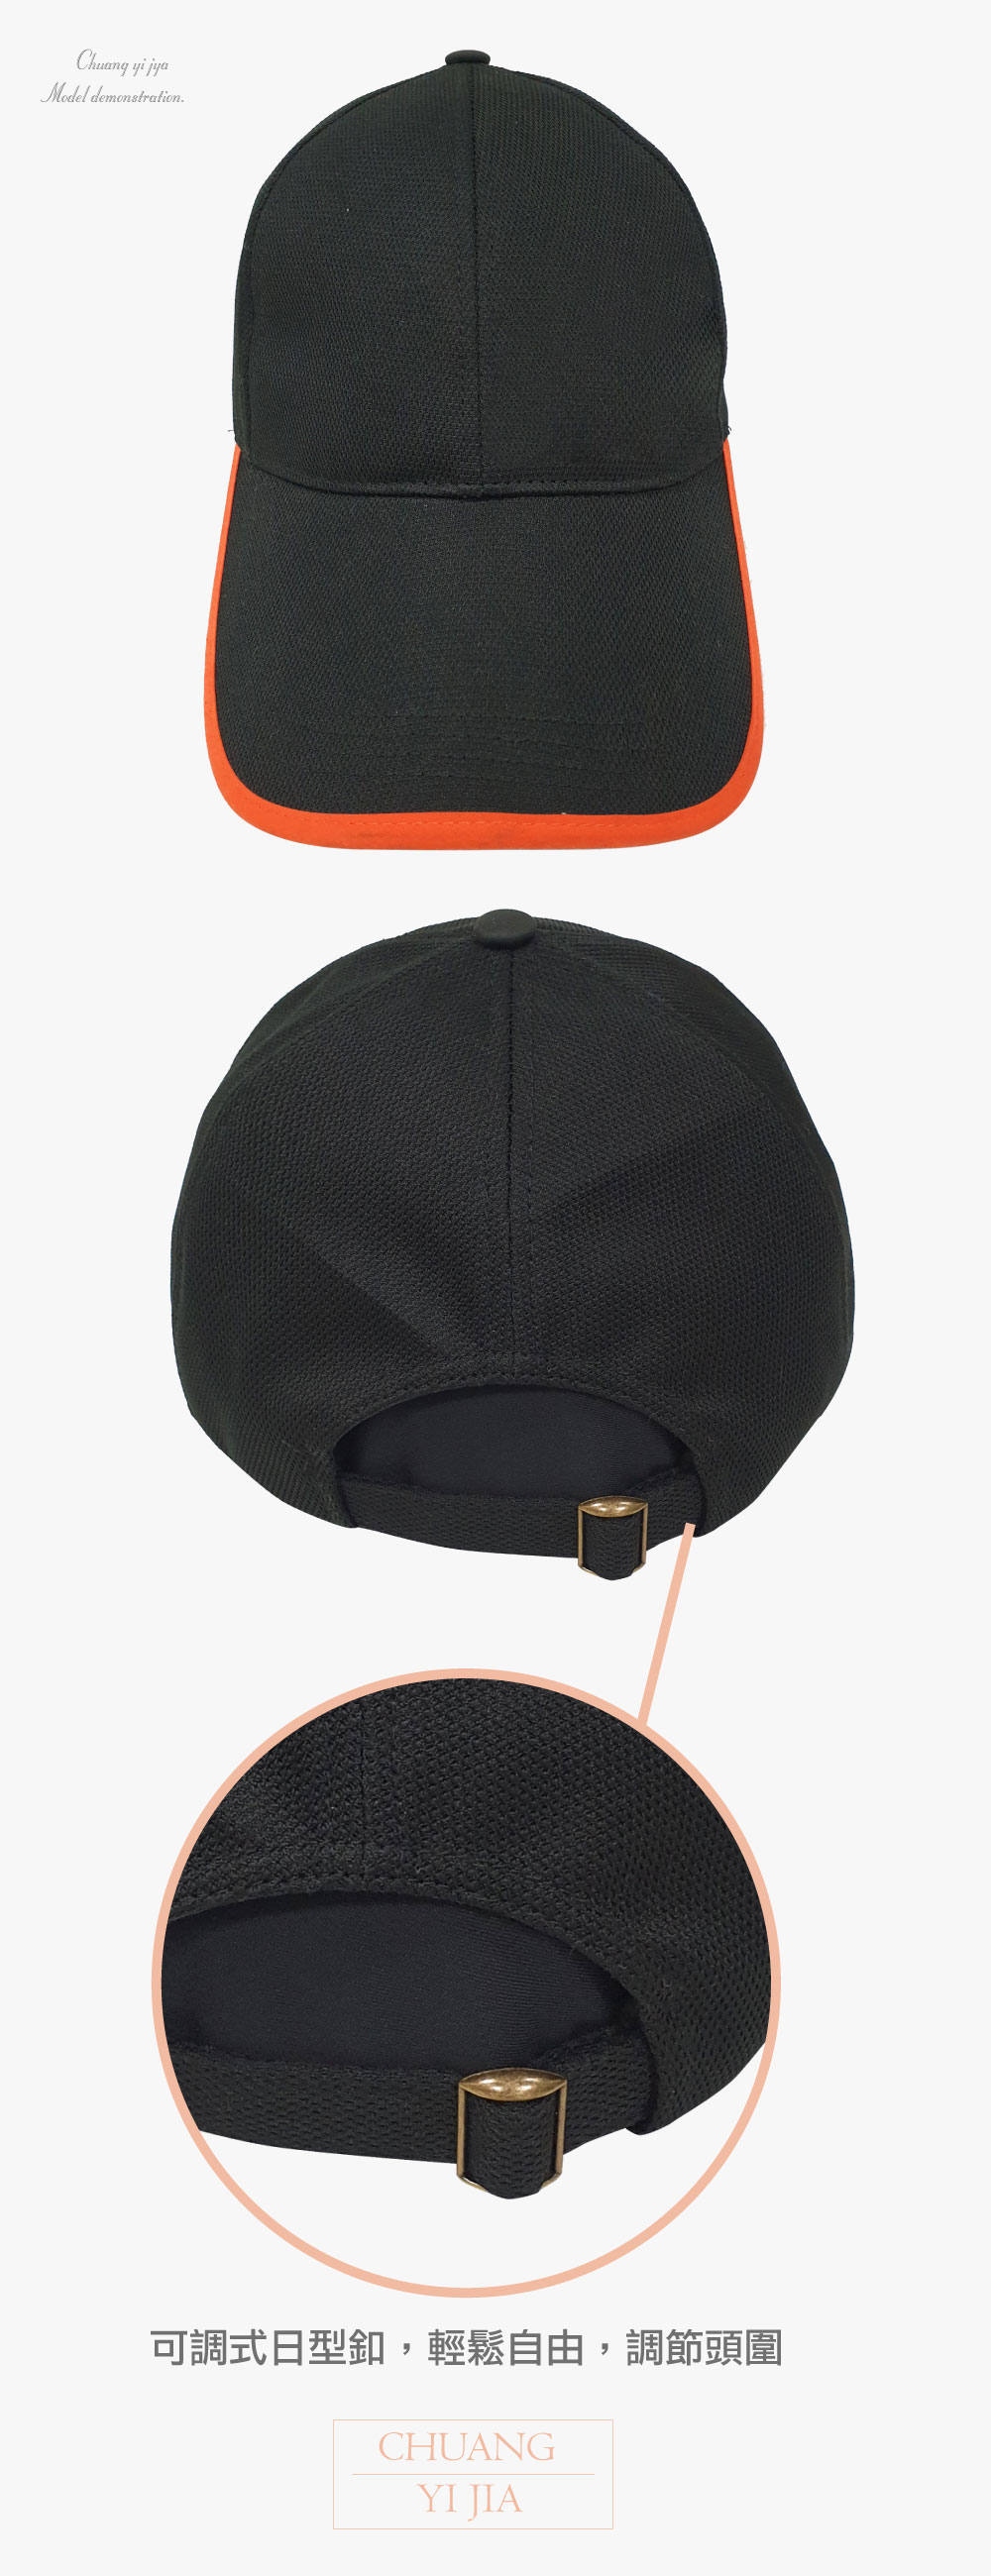 pk布透氣帽